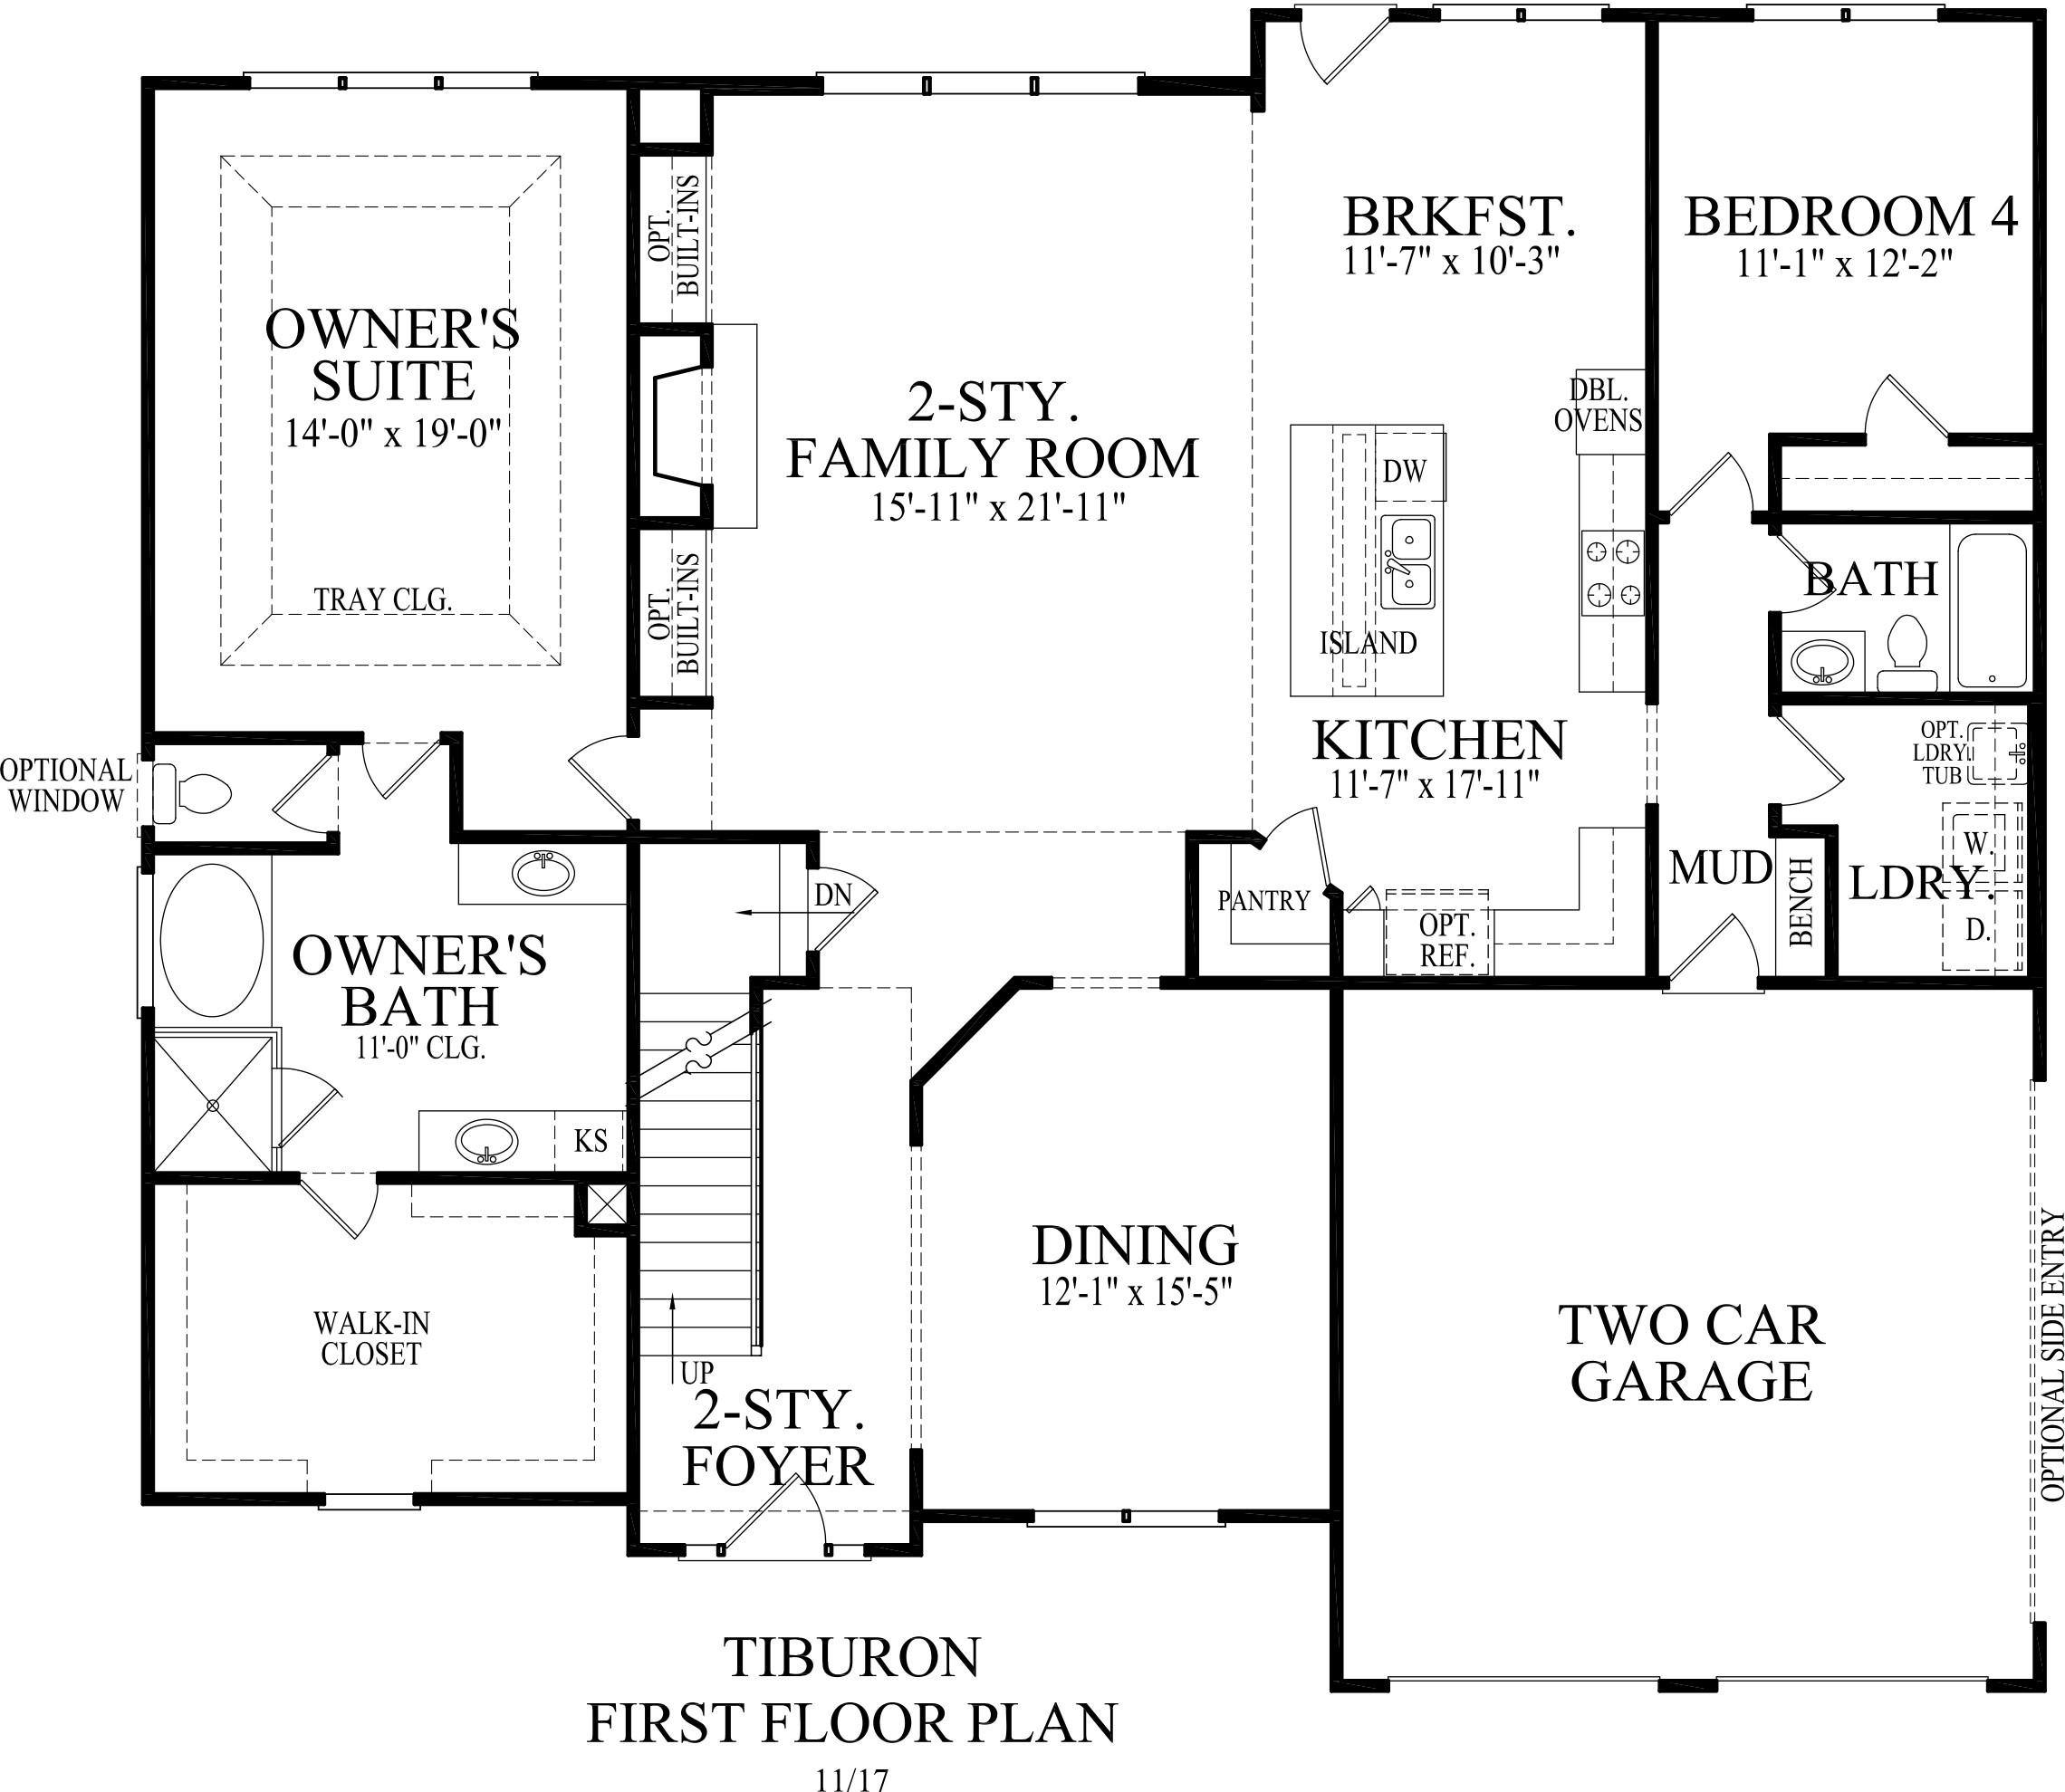 Tiburon-1st-Floor-Plan.jpg